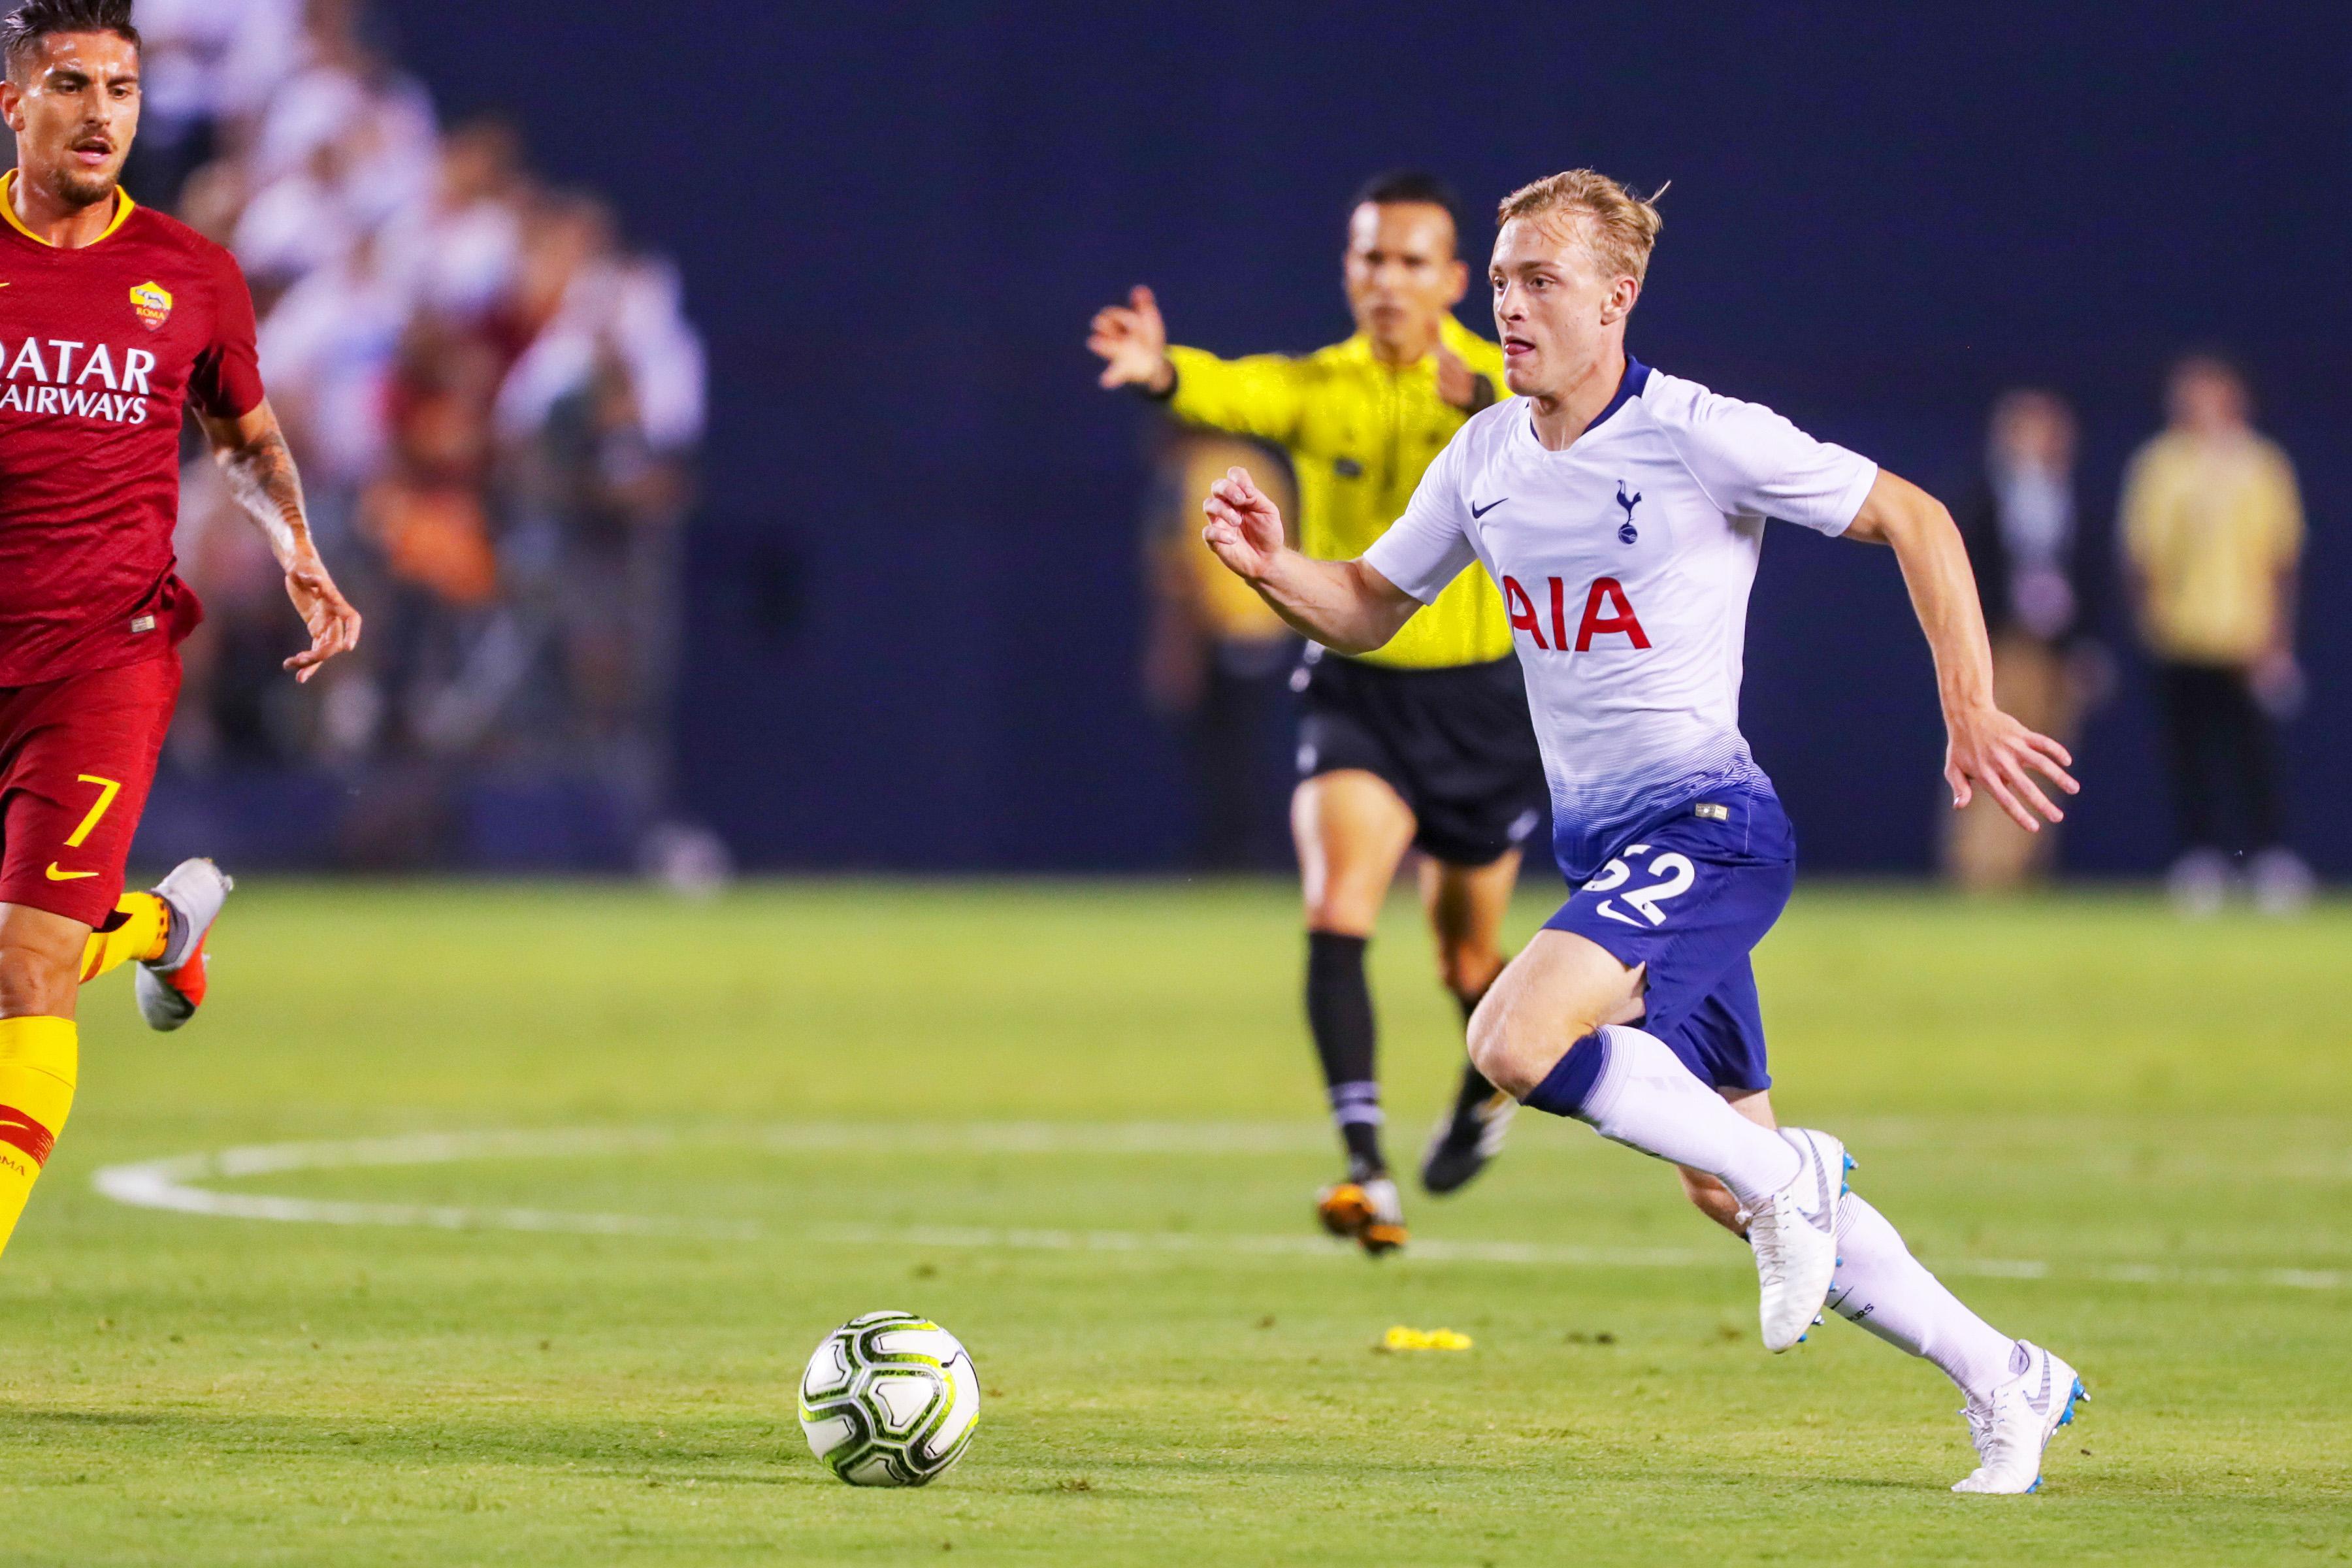 Oliver Skipp has shone for Tottenham so far in pre-season